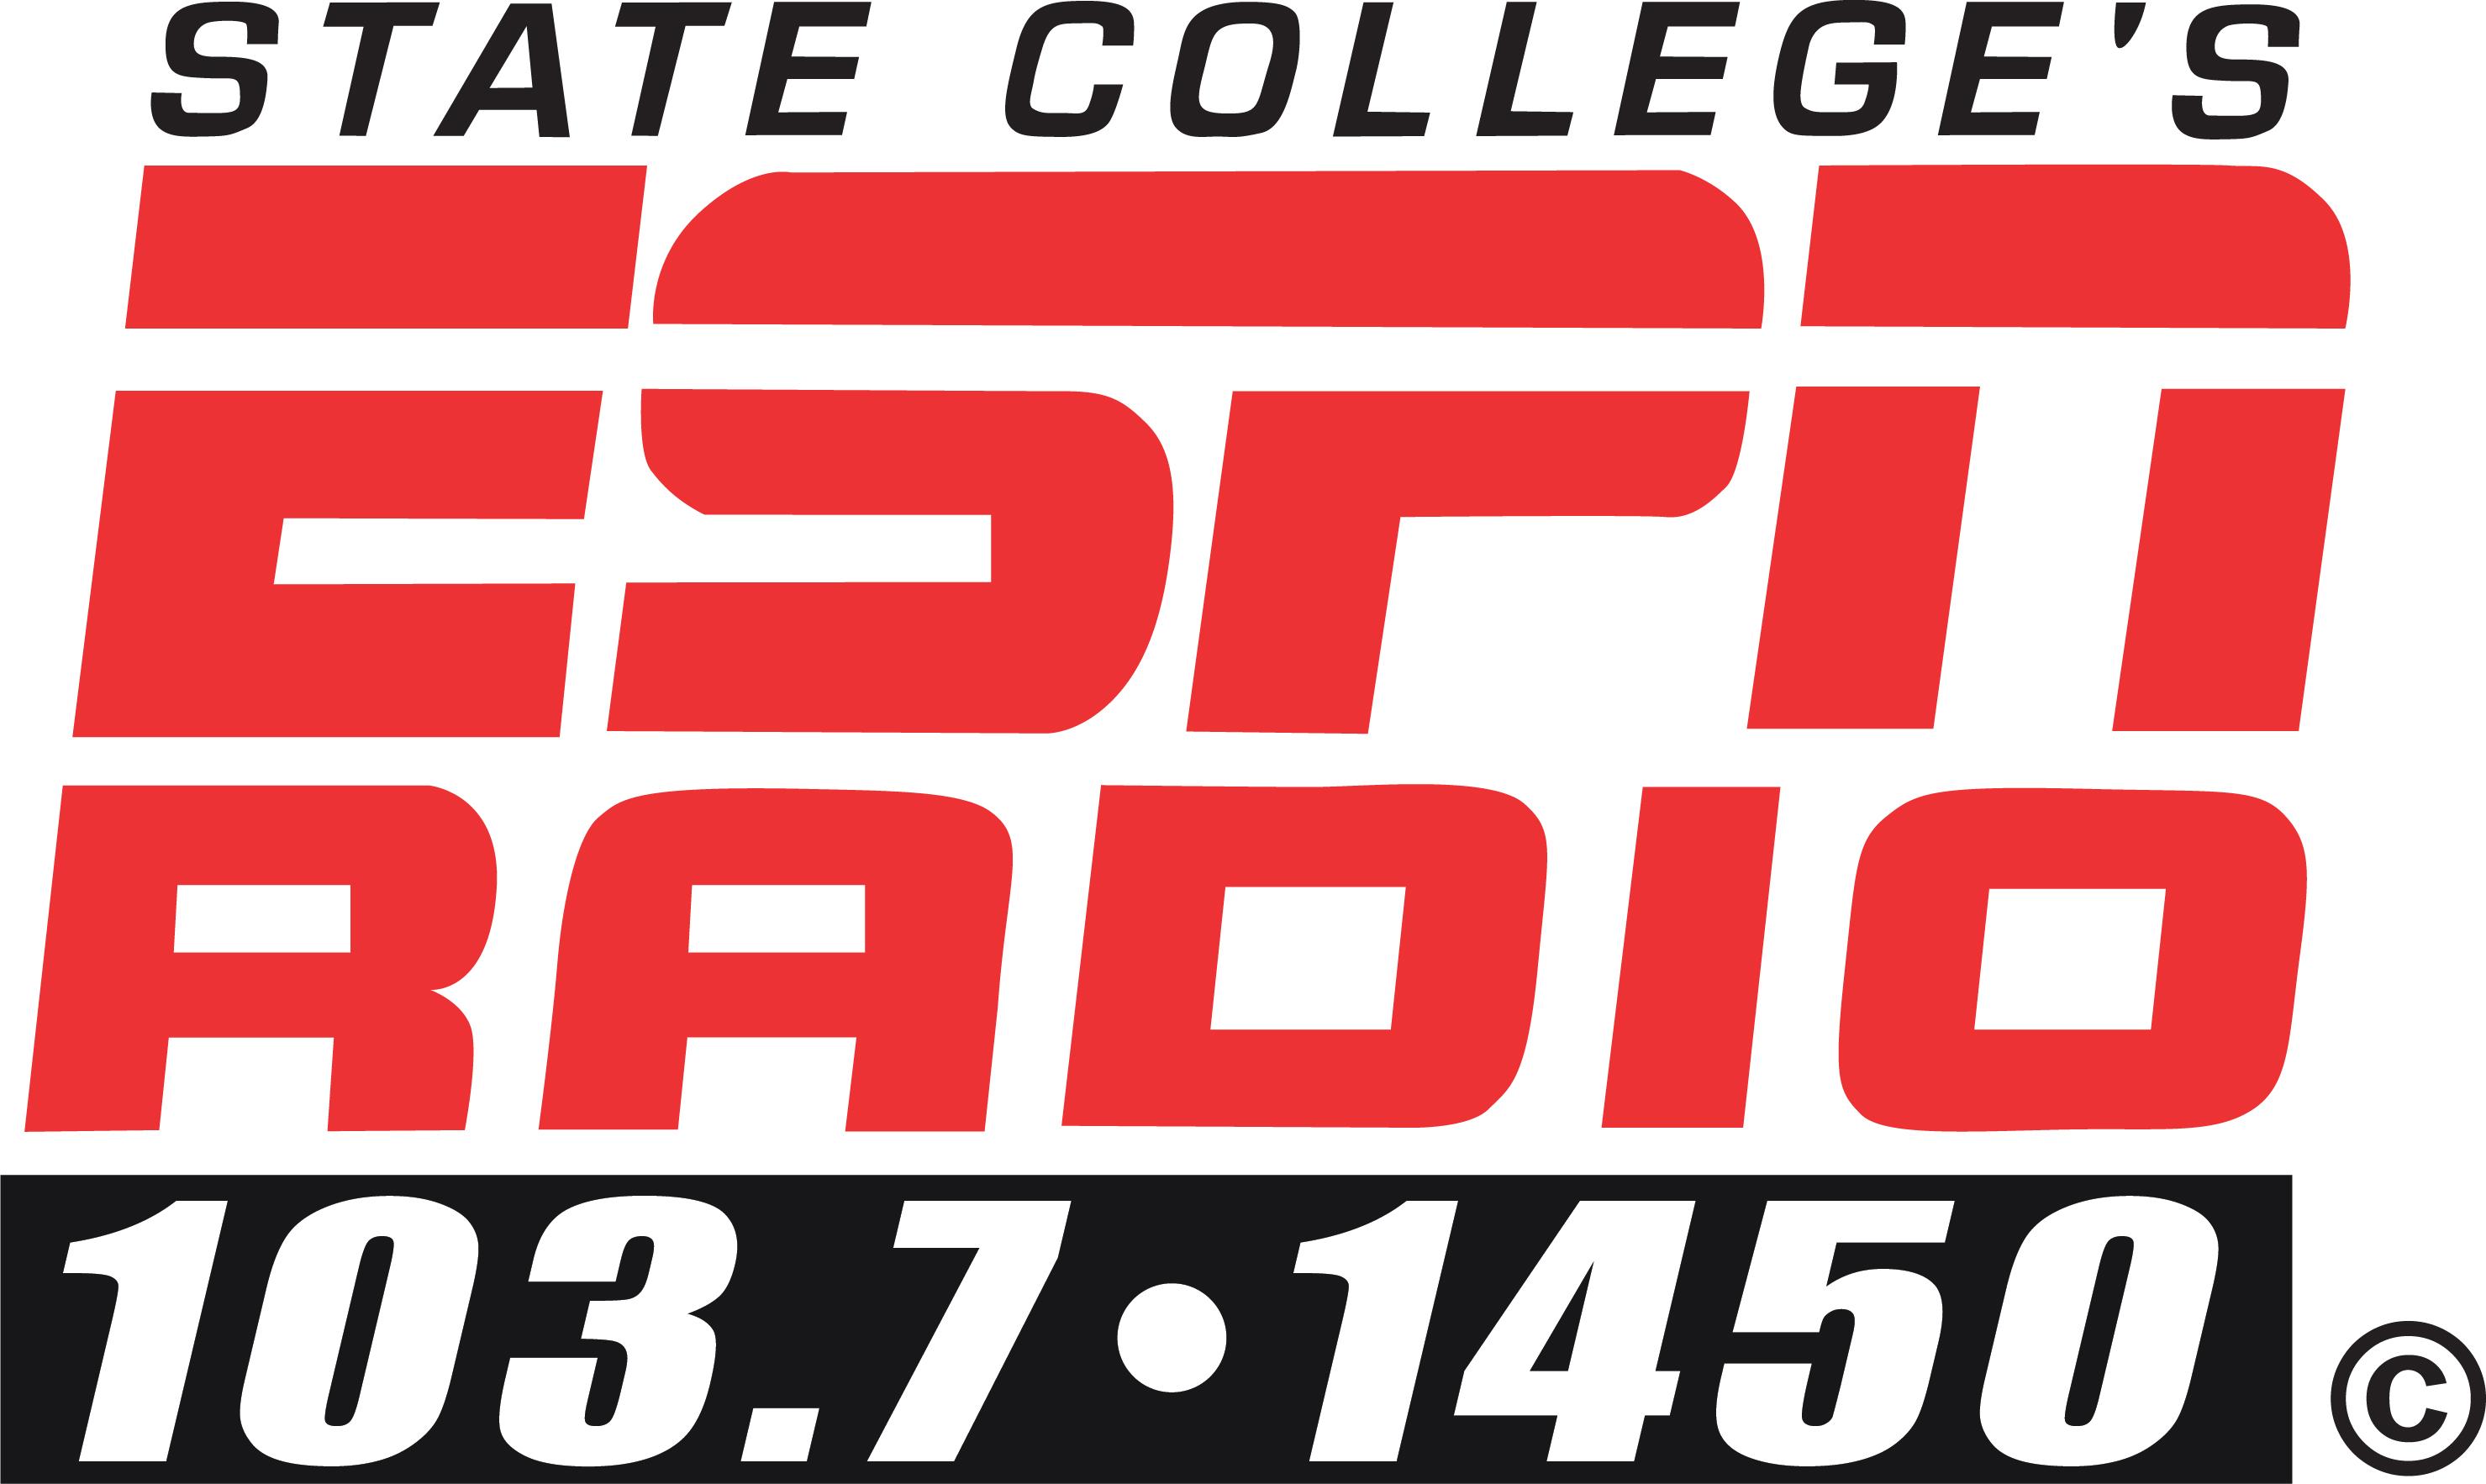 State College's ESPN 103.7 & 1450